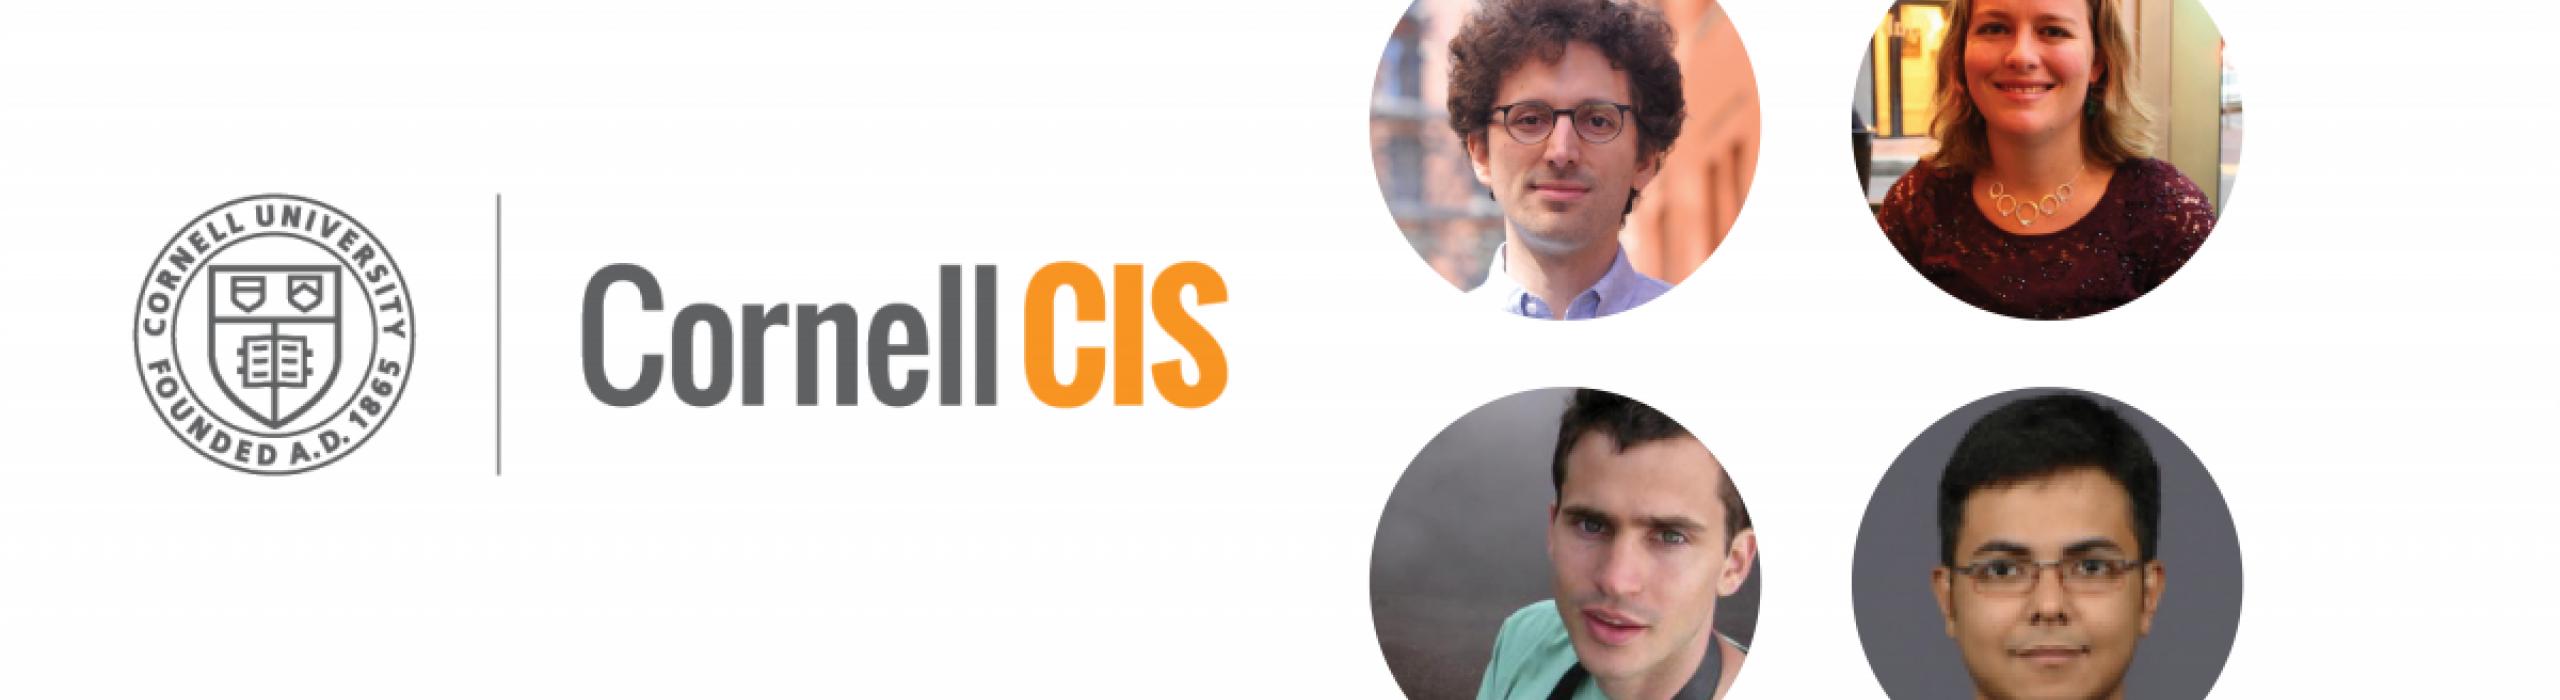 Yoav Artzi, Cristian Danescu-Niculescu-Mizil, Nicola Dell, and Karthik Sridharan.